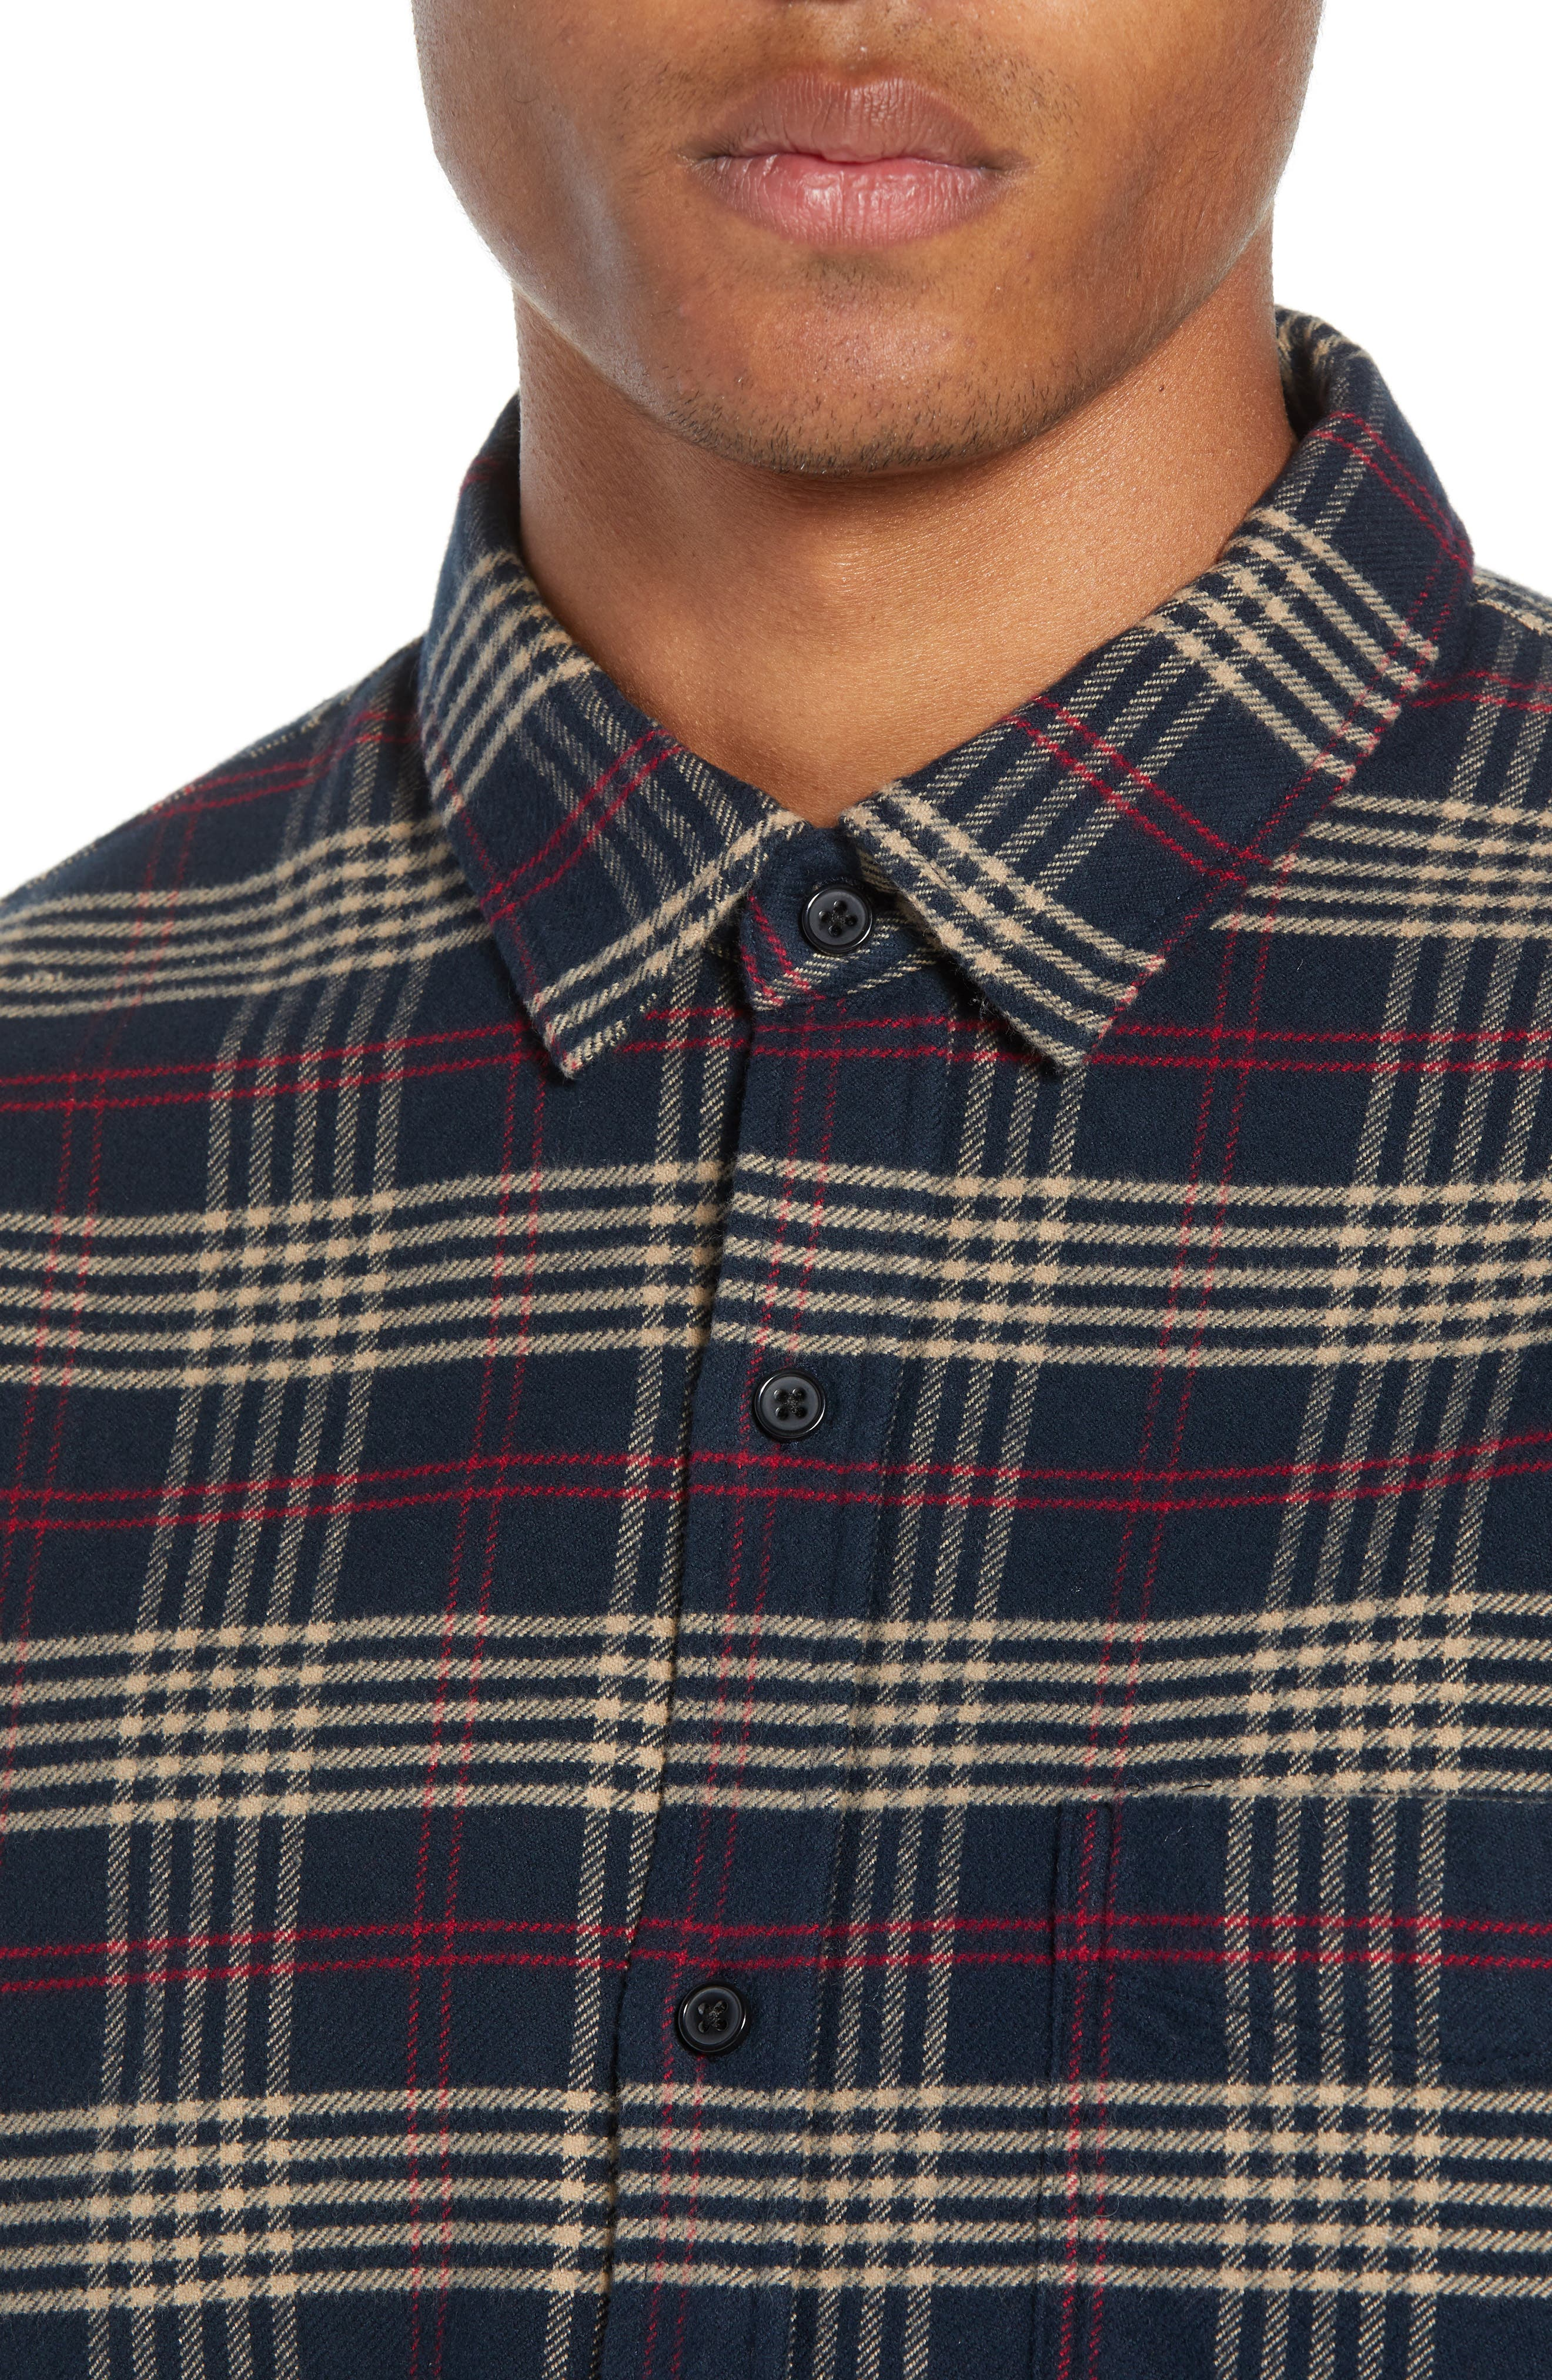 Forrest Slim Fit Plaid Flannel Sport Shirt,                             Alternate thumbnail 2, color,                             NAVY/RED/ELM